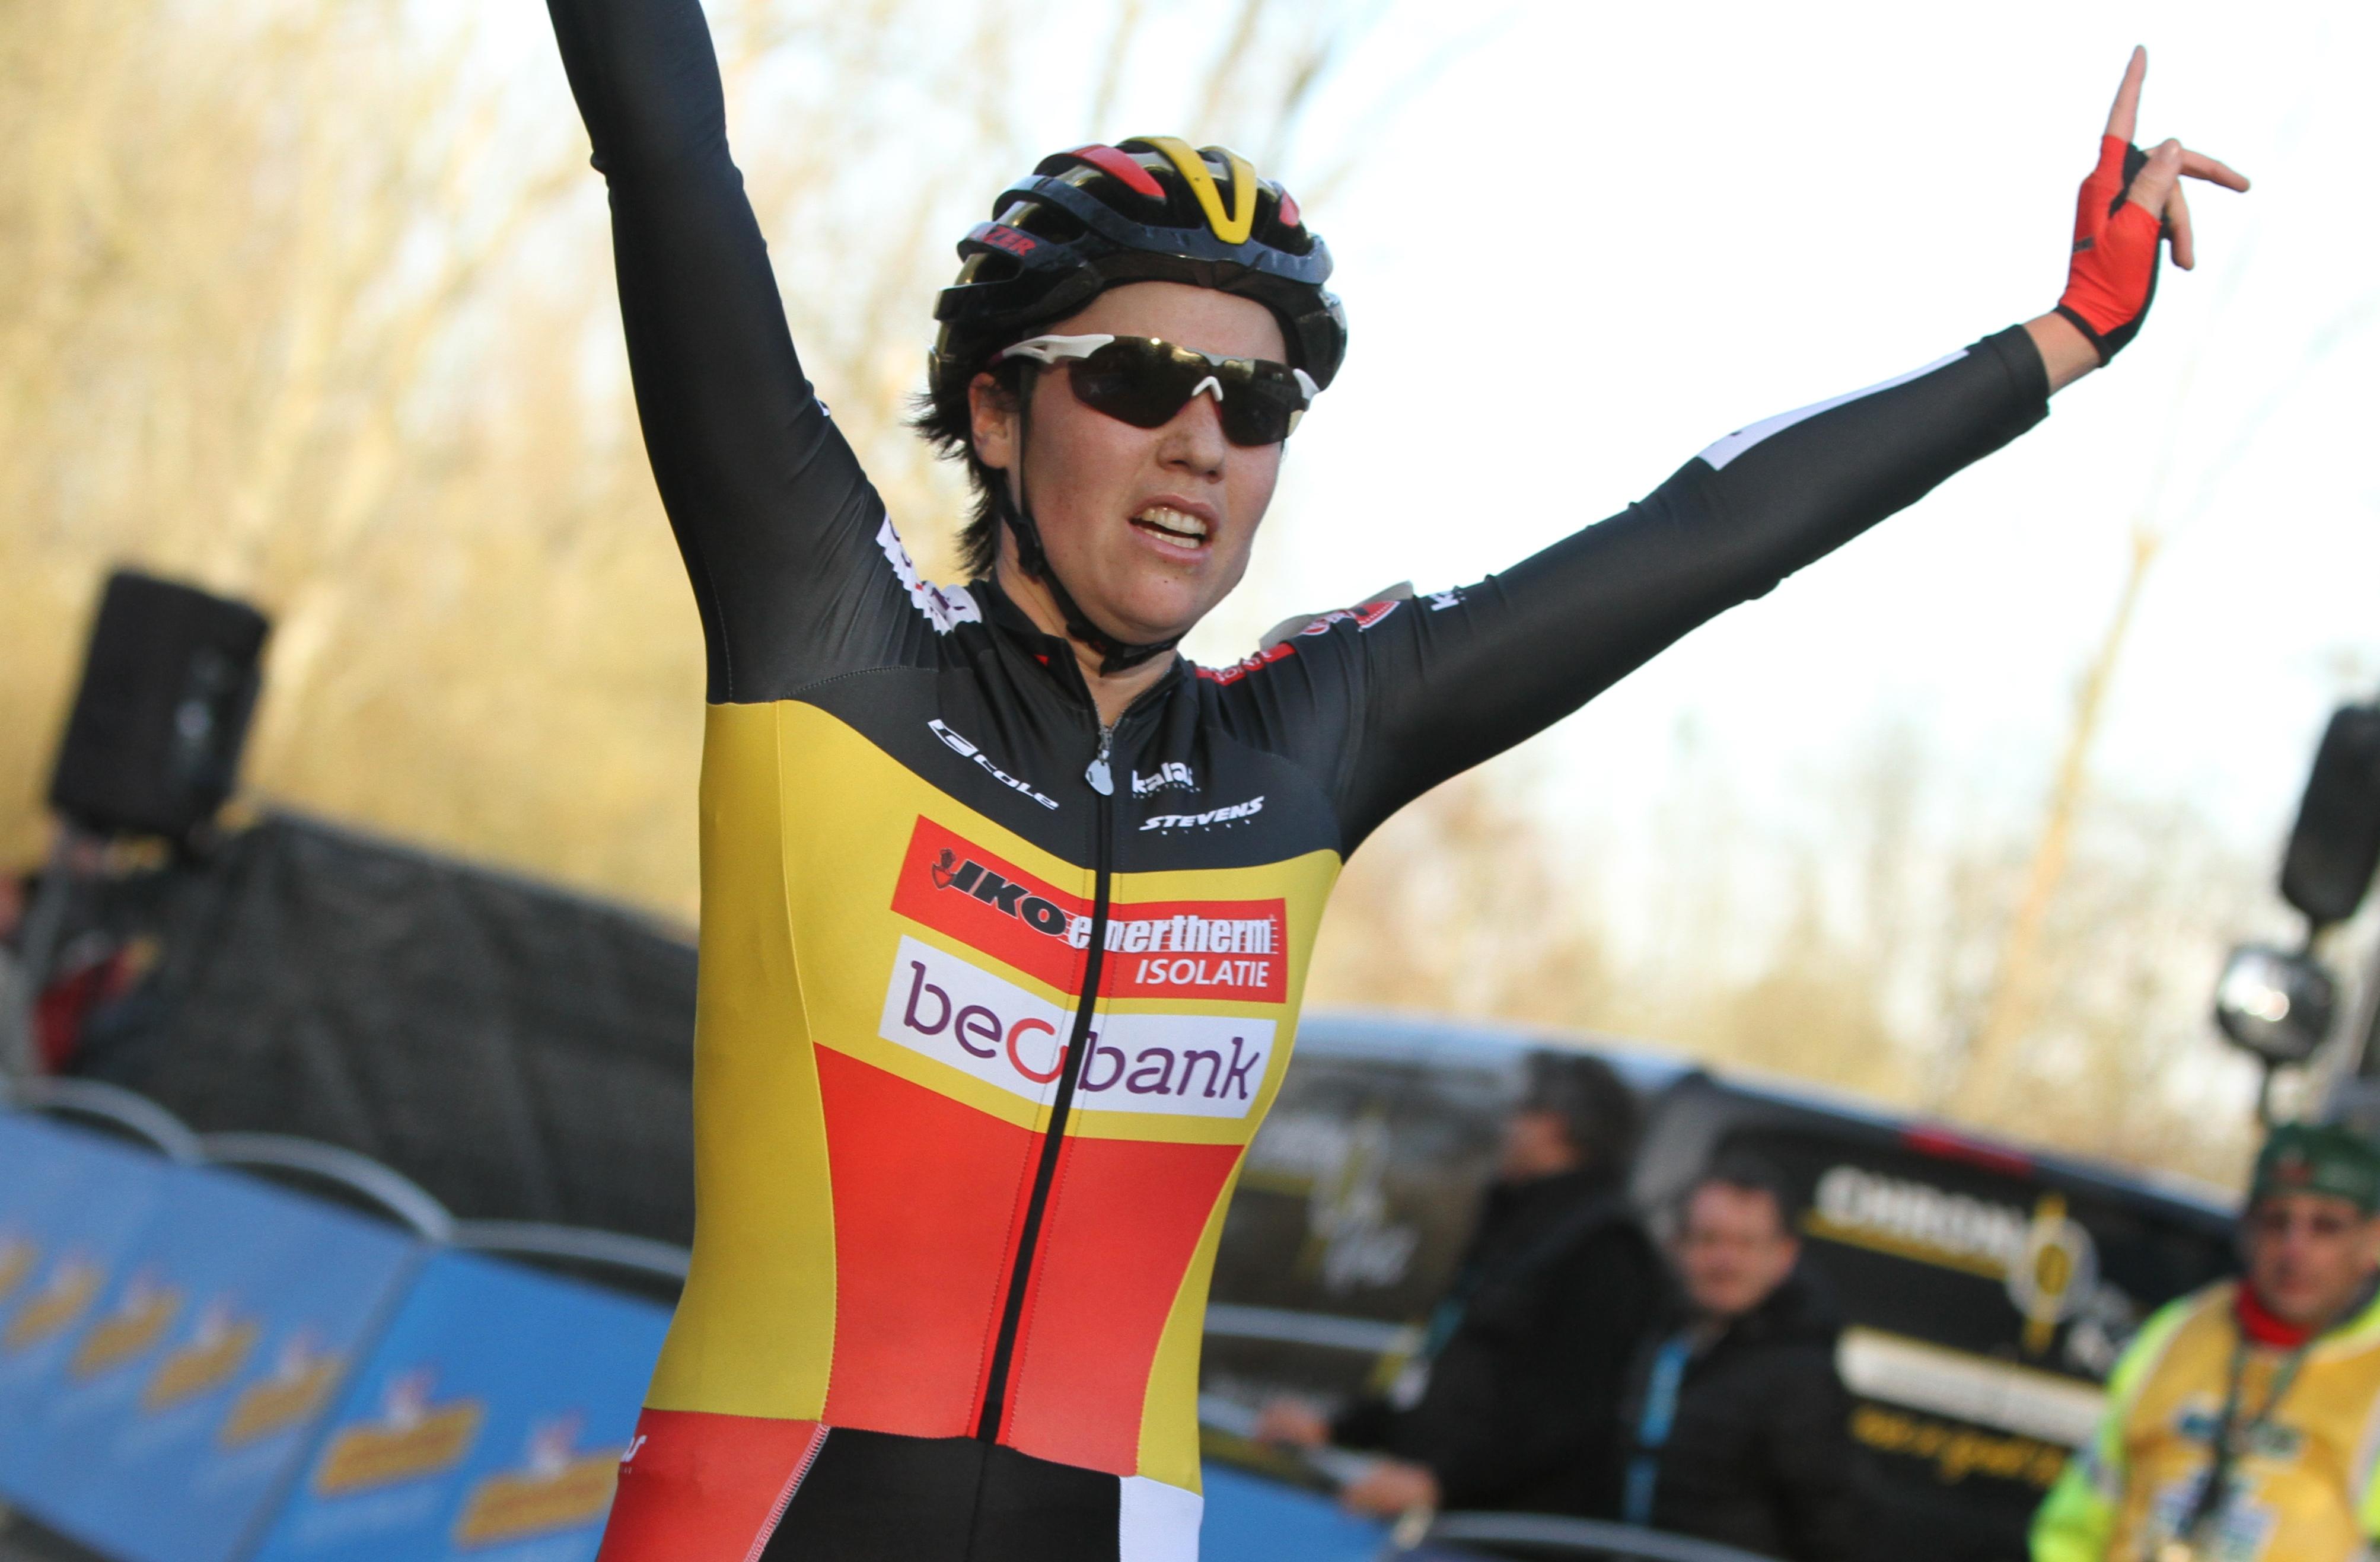 10e overwinning voor Sanne Cant in de Flandriencross in Hamme